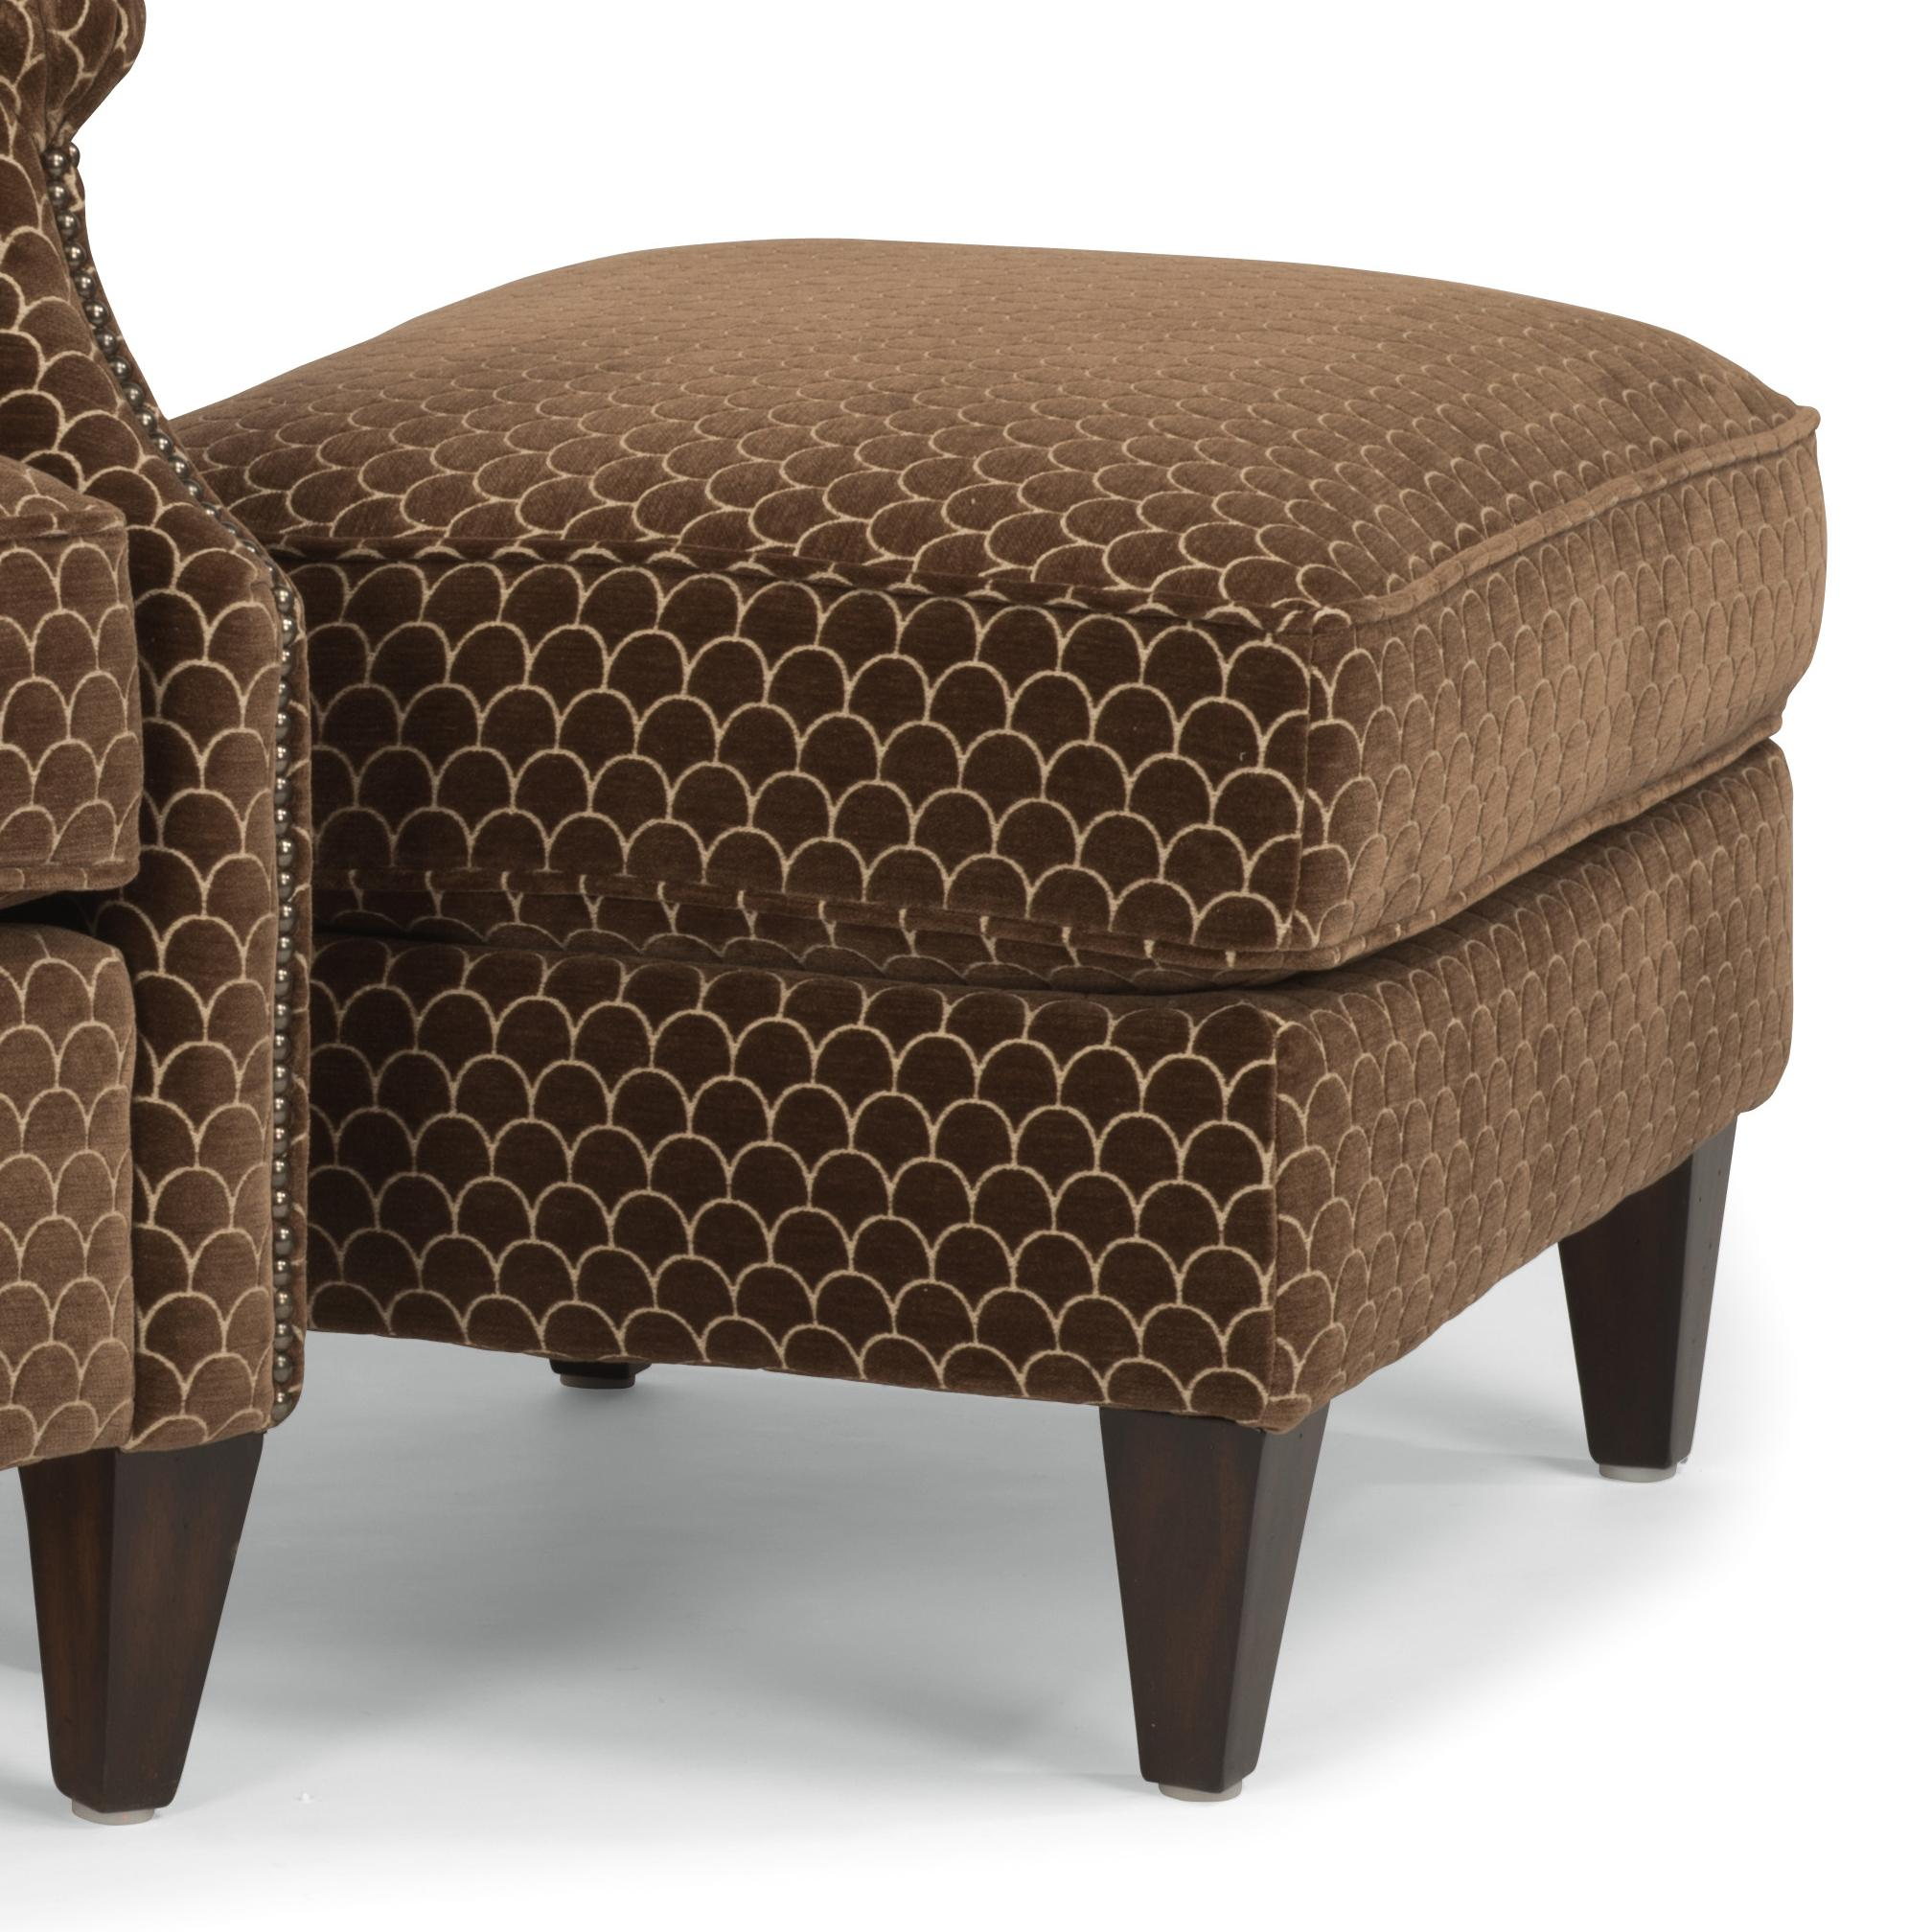 Zevon Ottoman by Flexsteel at Steger's Furniture